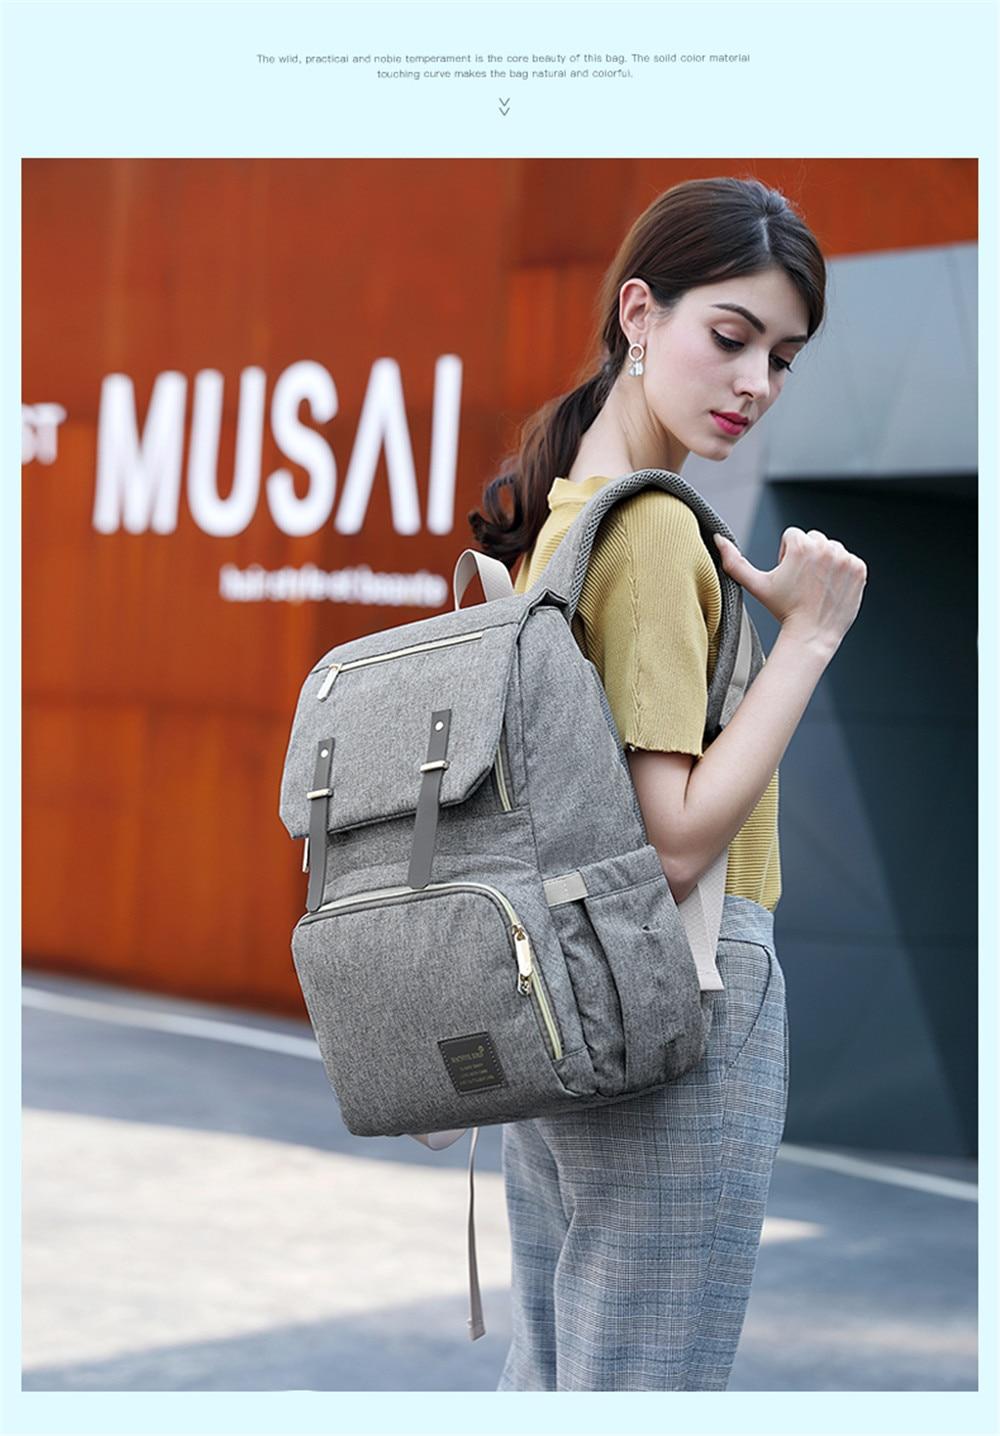 HTB1agwsaoLrK1Rjy1zbq6AenFXak Fashion Large Capacity Baby Nappy Bag Diaper Bag Purse Multifunction USB Mummy Travel Backpack Women Nursing Bags For Mom Daddy